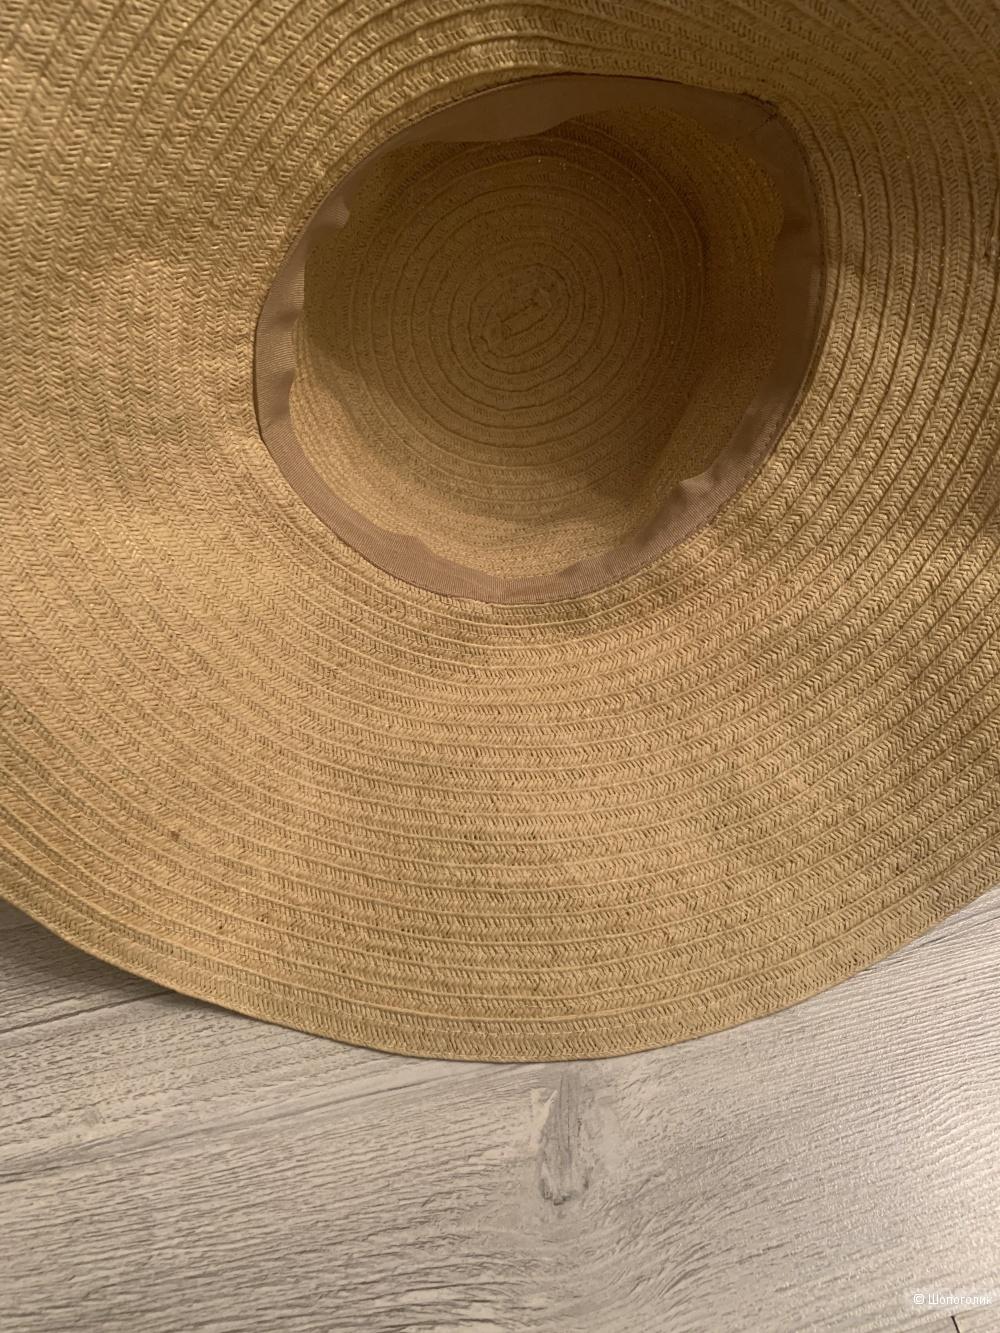 Шляпа соломенная Faberlic, one size